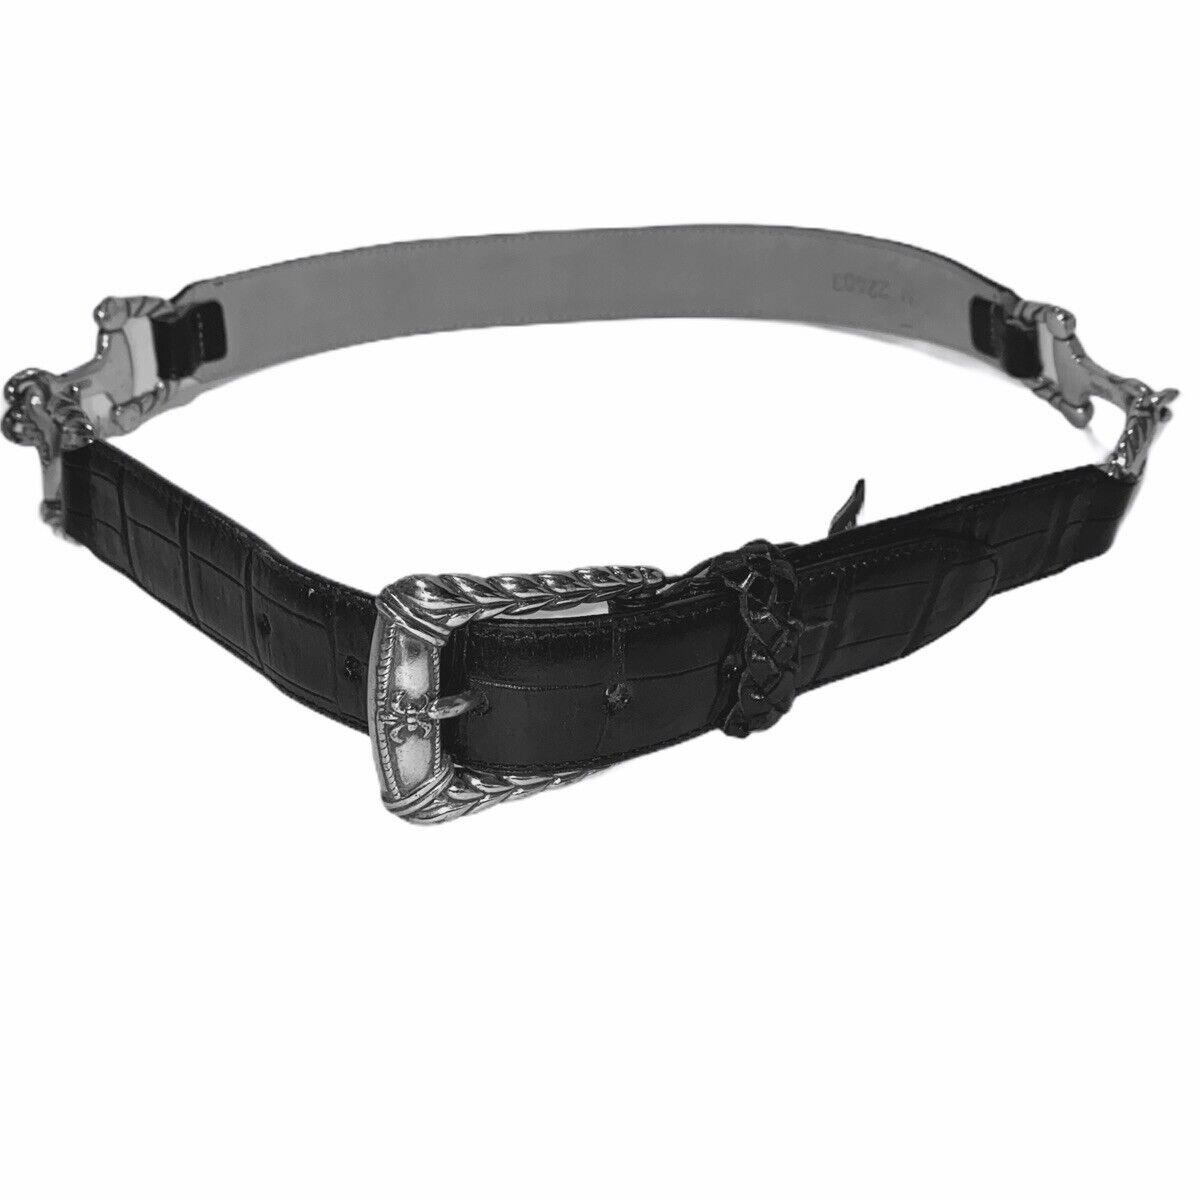 BRIGHTON Women Leather Belt Croc Horse Bit Black Silver Tone Medium 22403